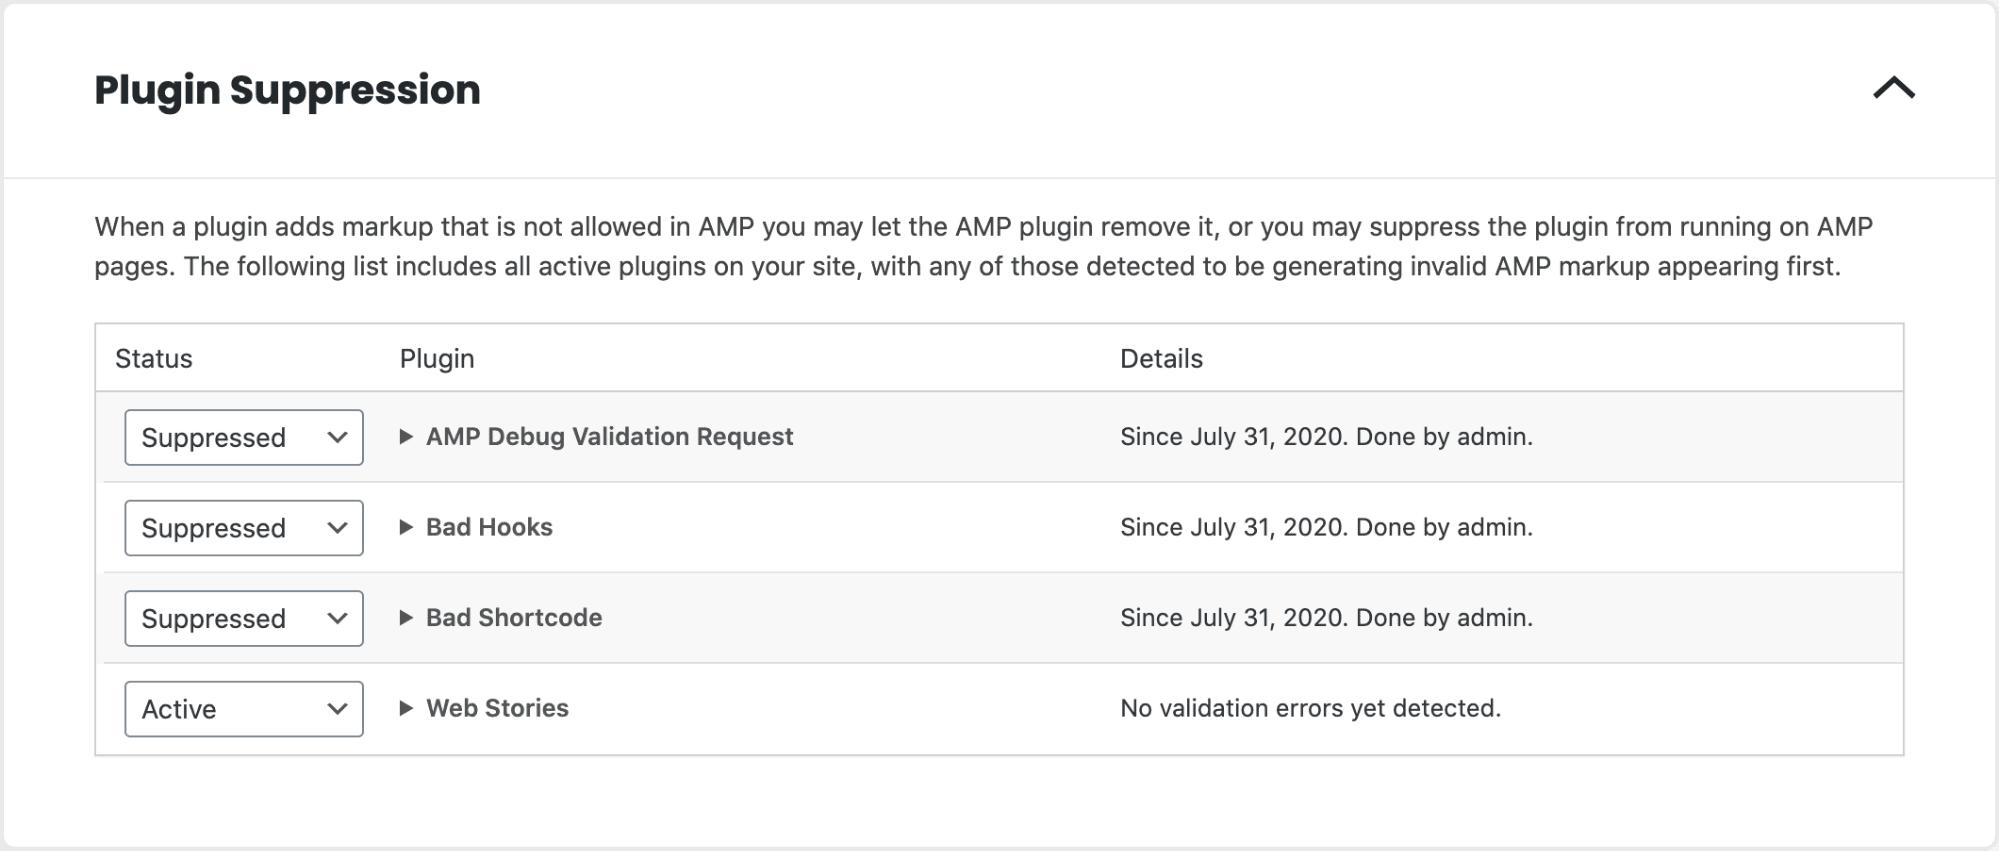 Amp Plugin Suppression